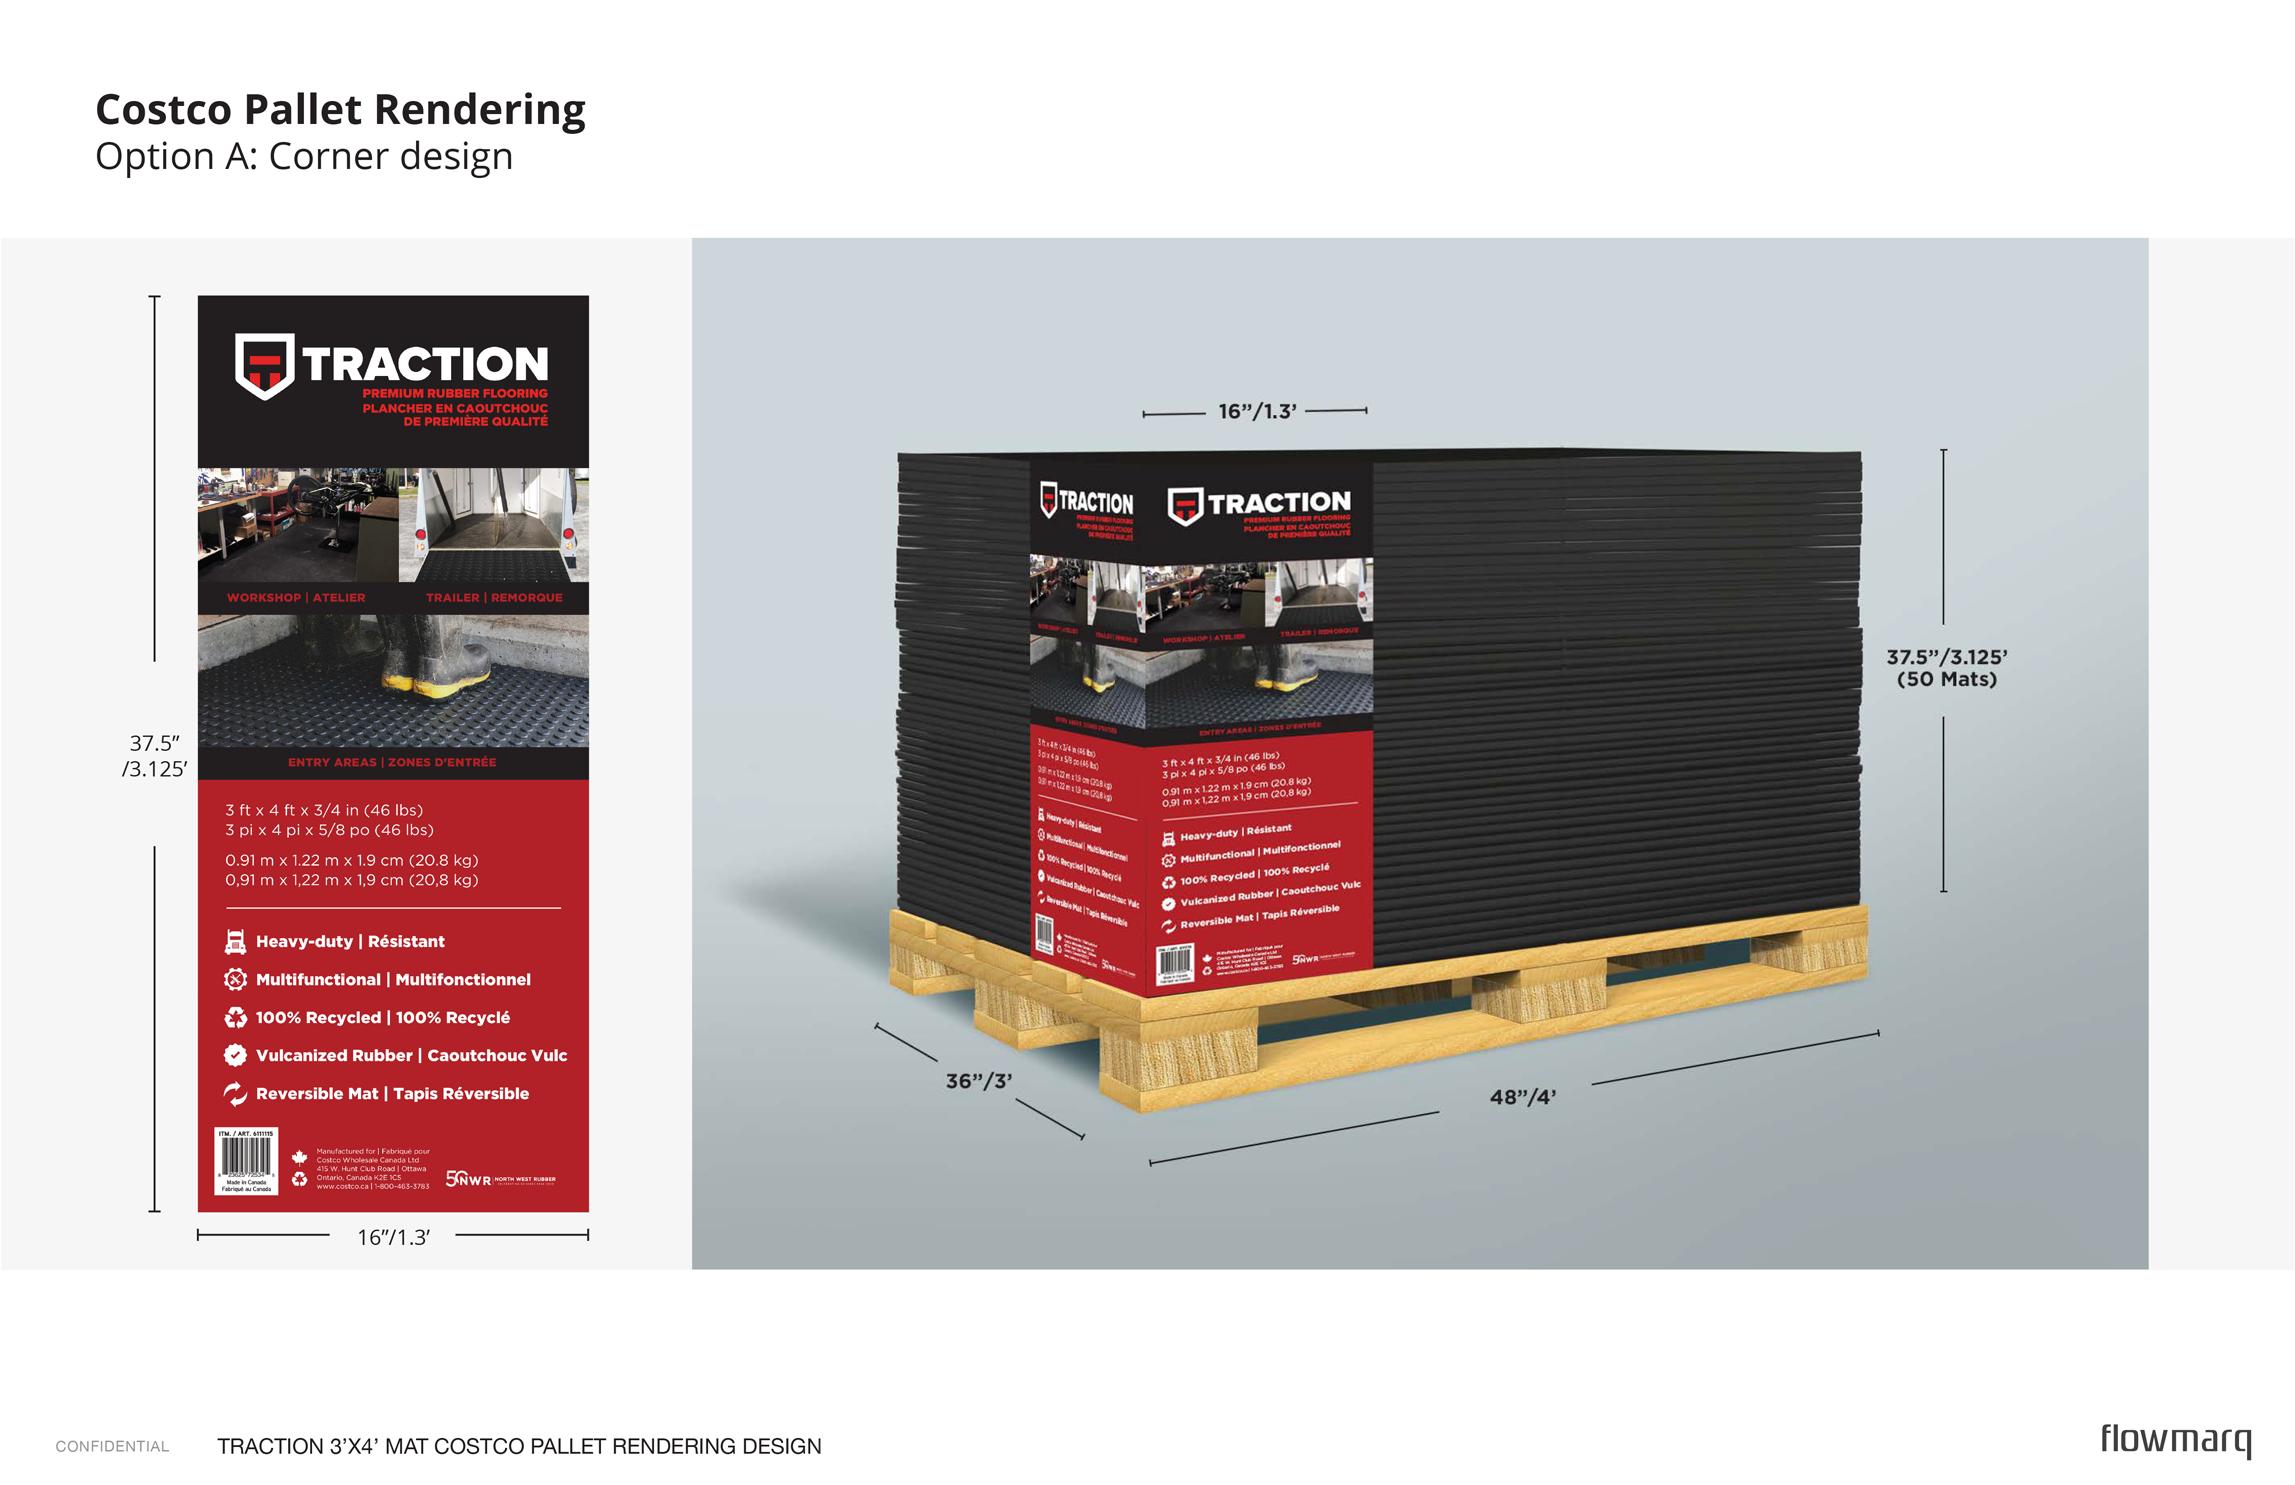 North West Rubber - Costco rendering corner design